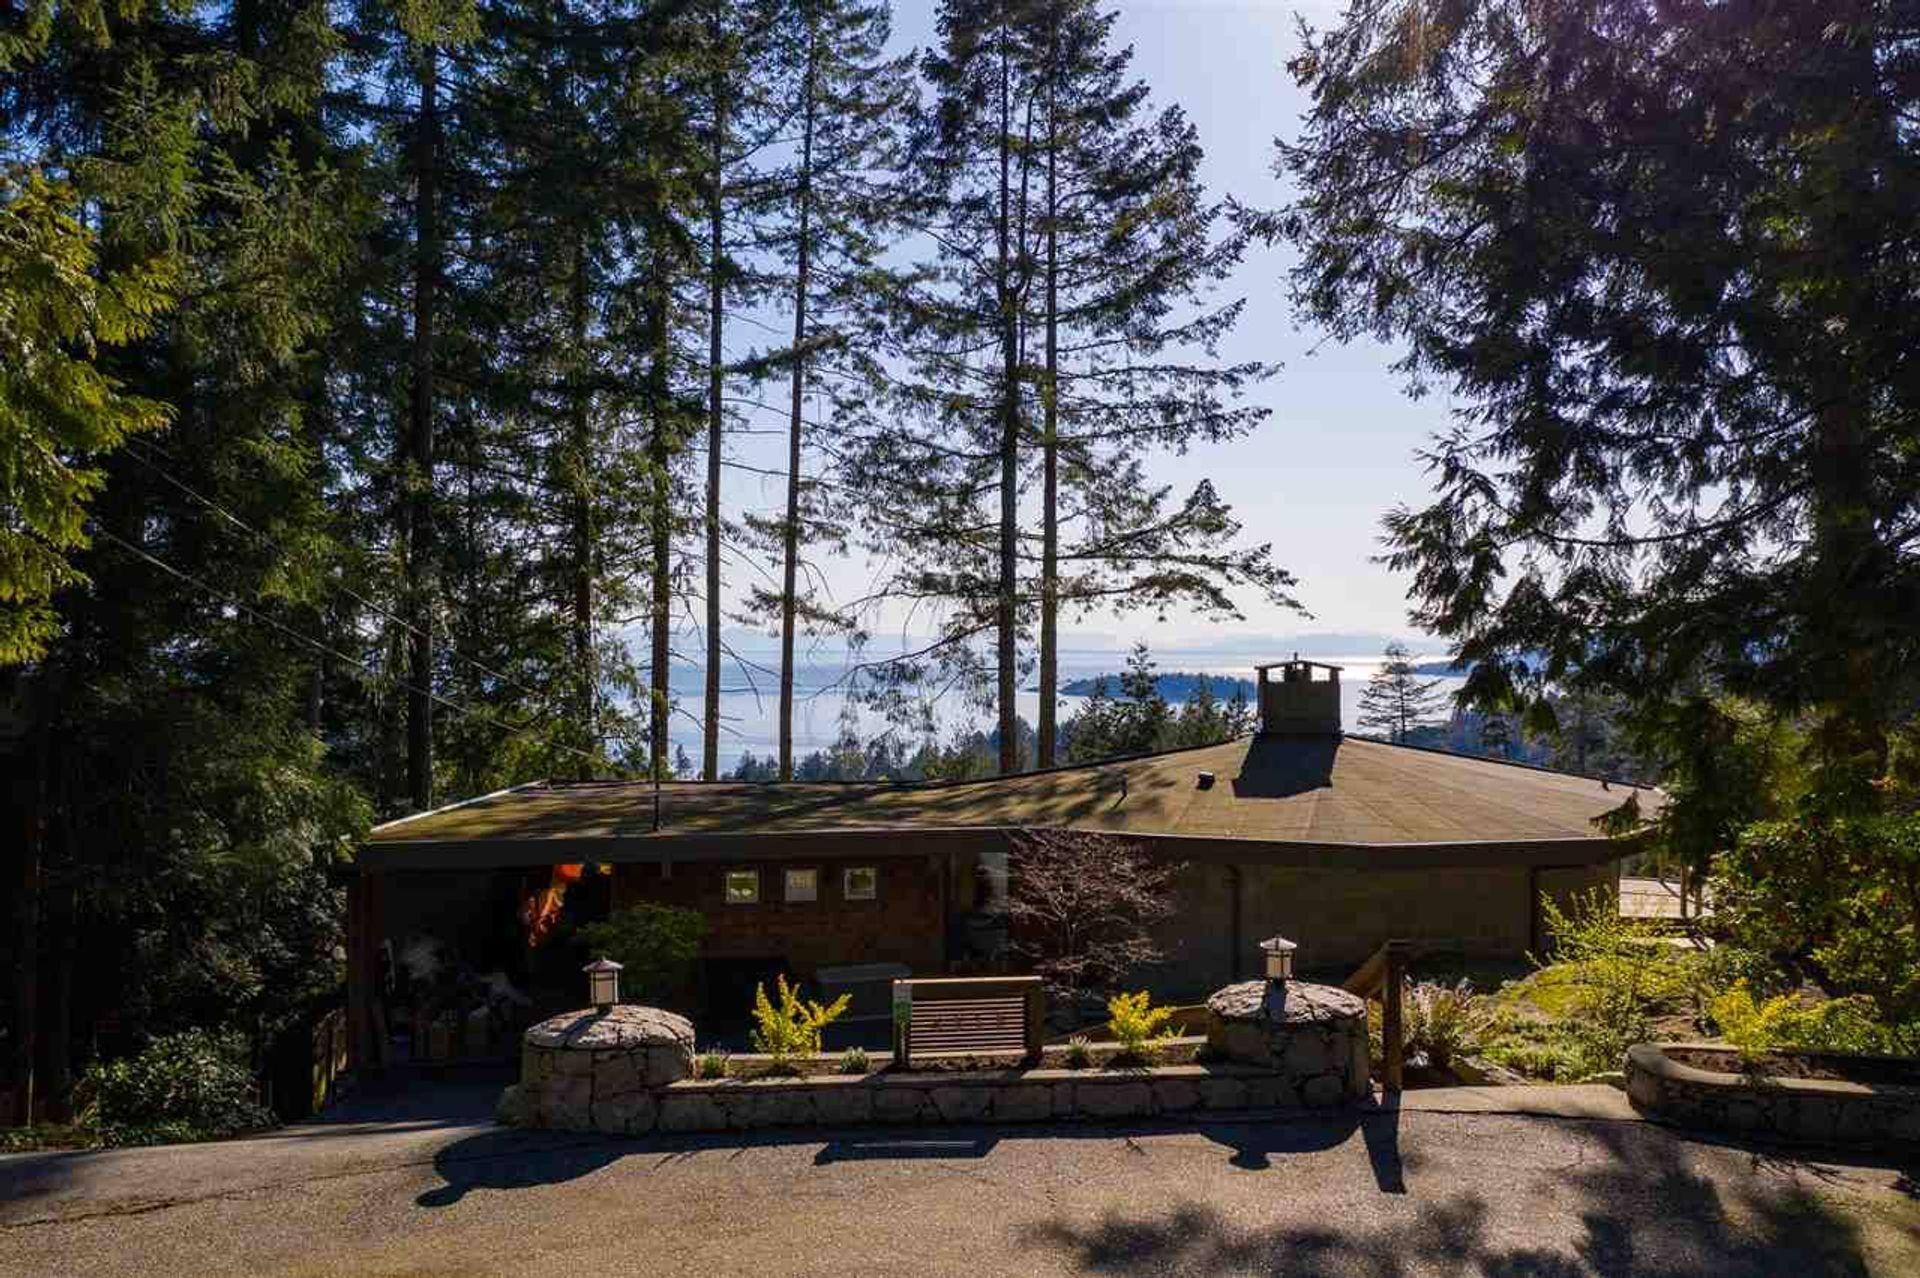 5616-westport-place-eagle-harbour-west-vancouver-28 at 5616 Westport Place, Eagle Harbour, West Vancouver